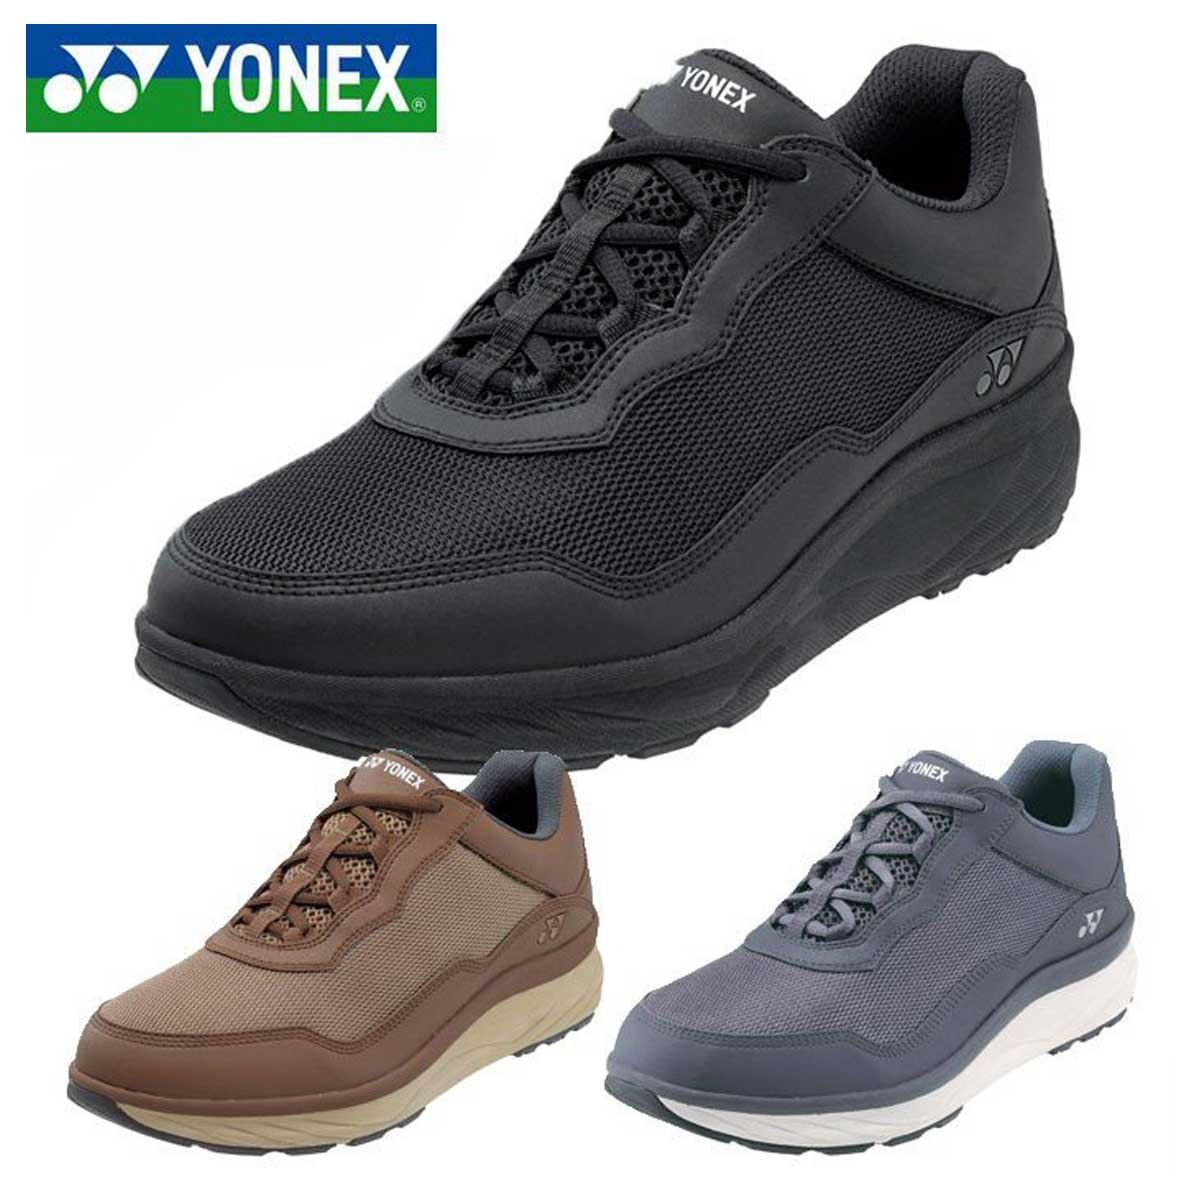 YONEX ヨネックス MC108 (メンズ)軽い疲れにくいウォーキングシューズ 「靴」